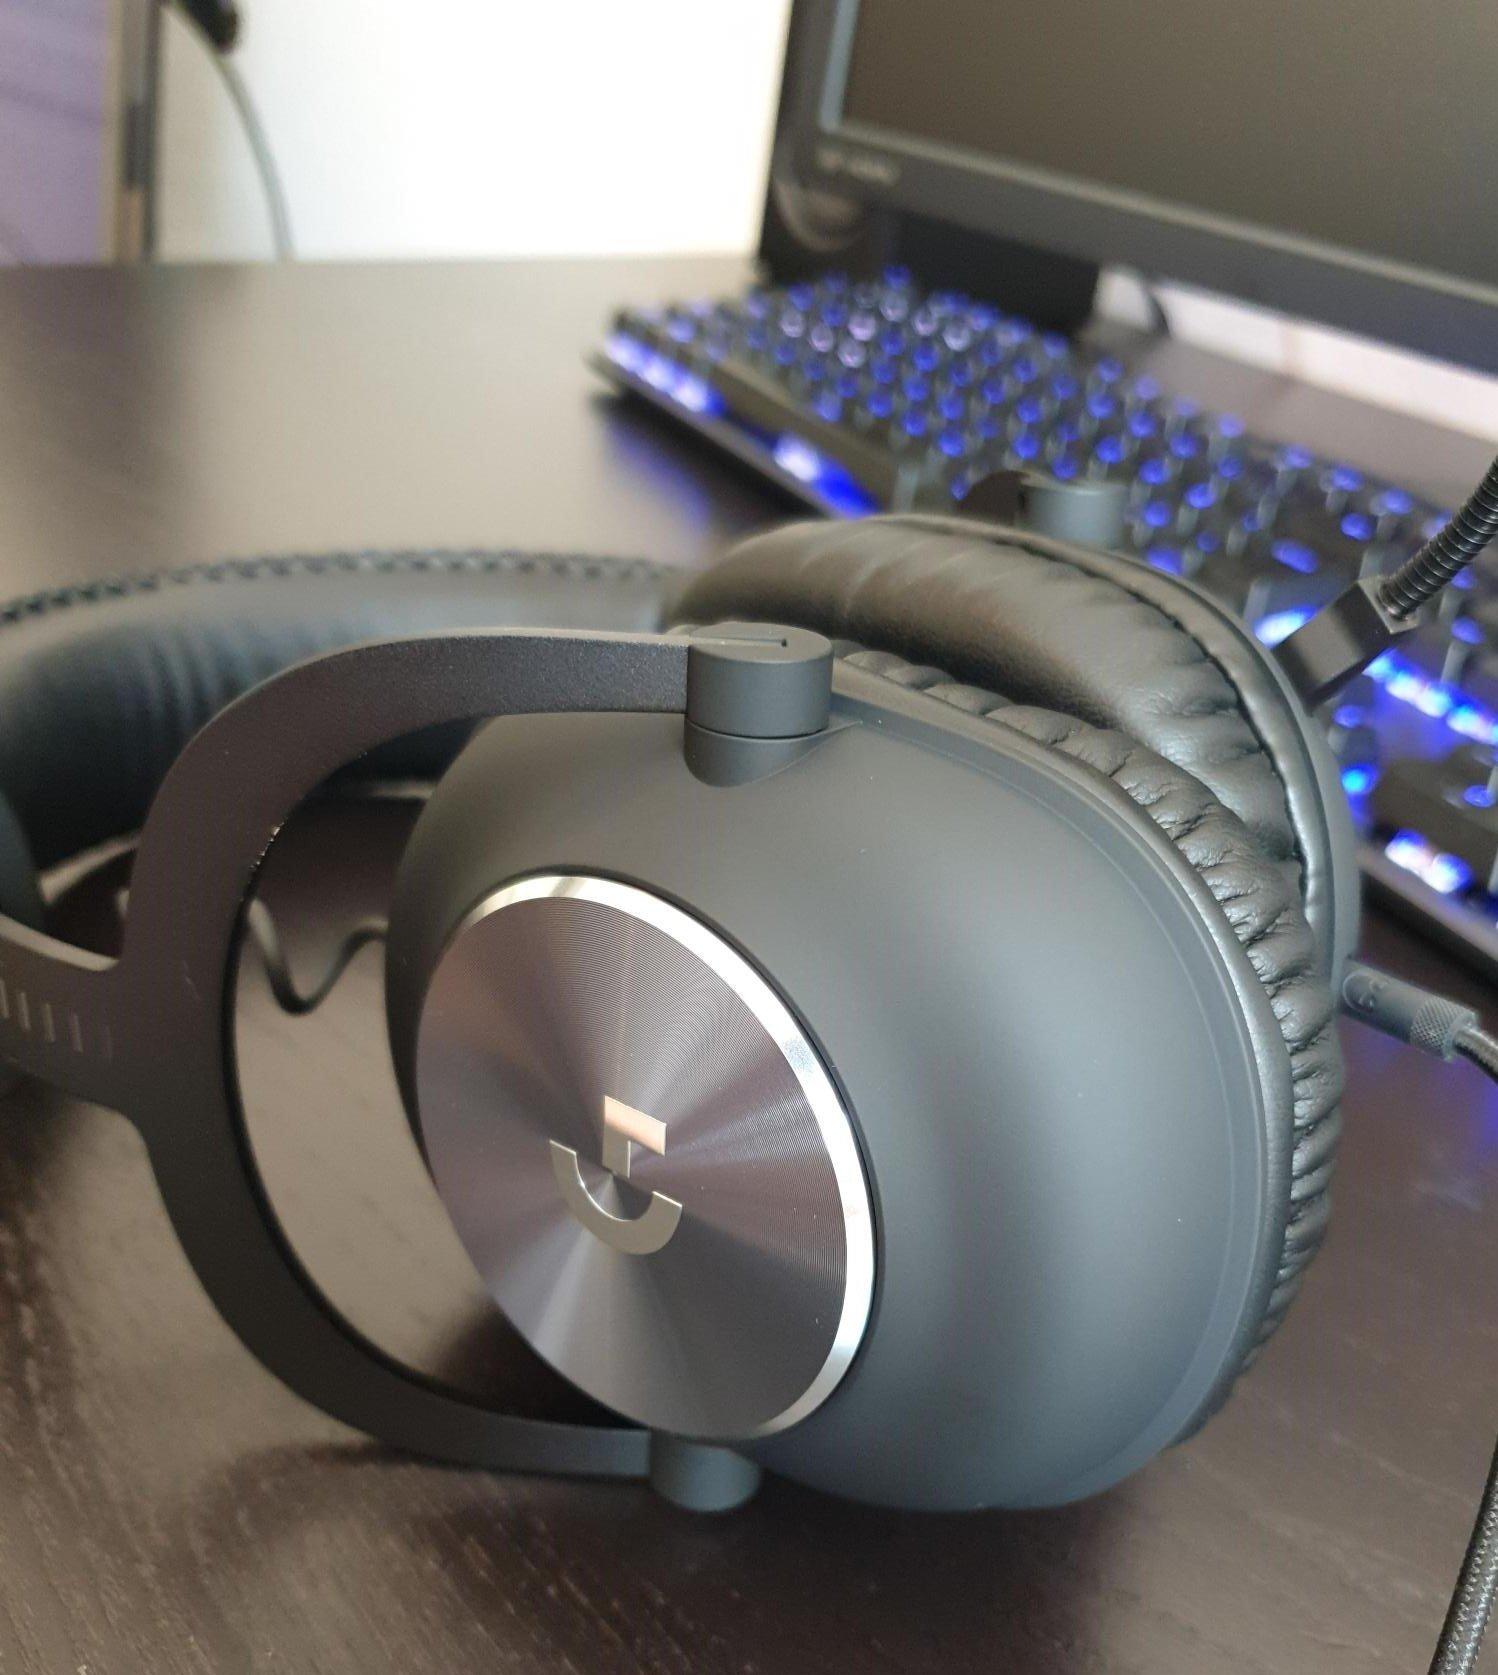 Image of Logitech G Pro X headset